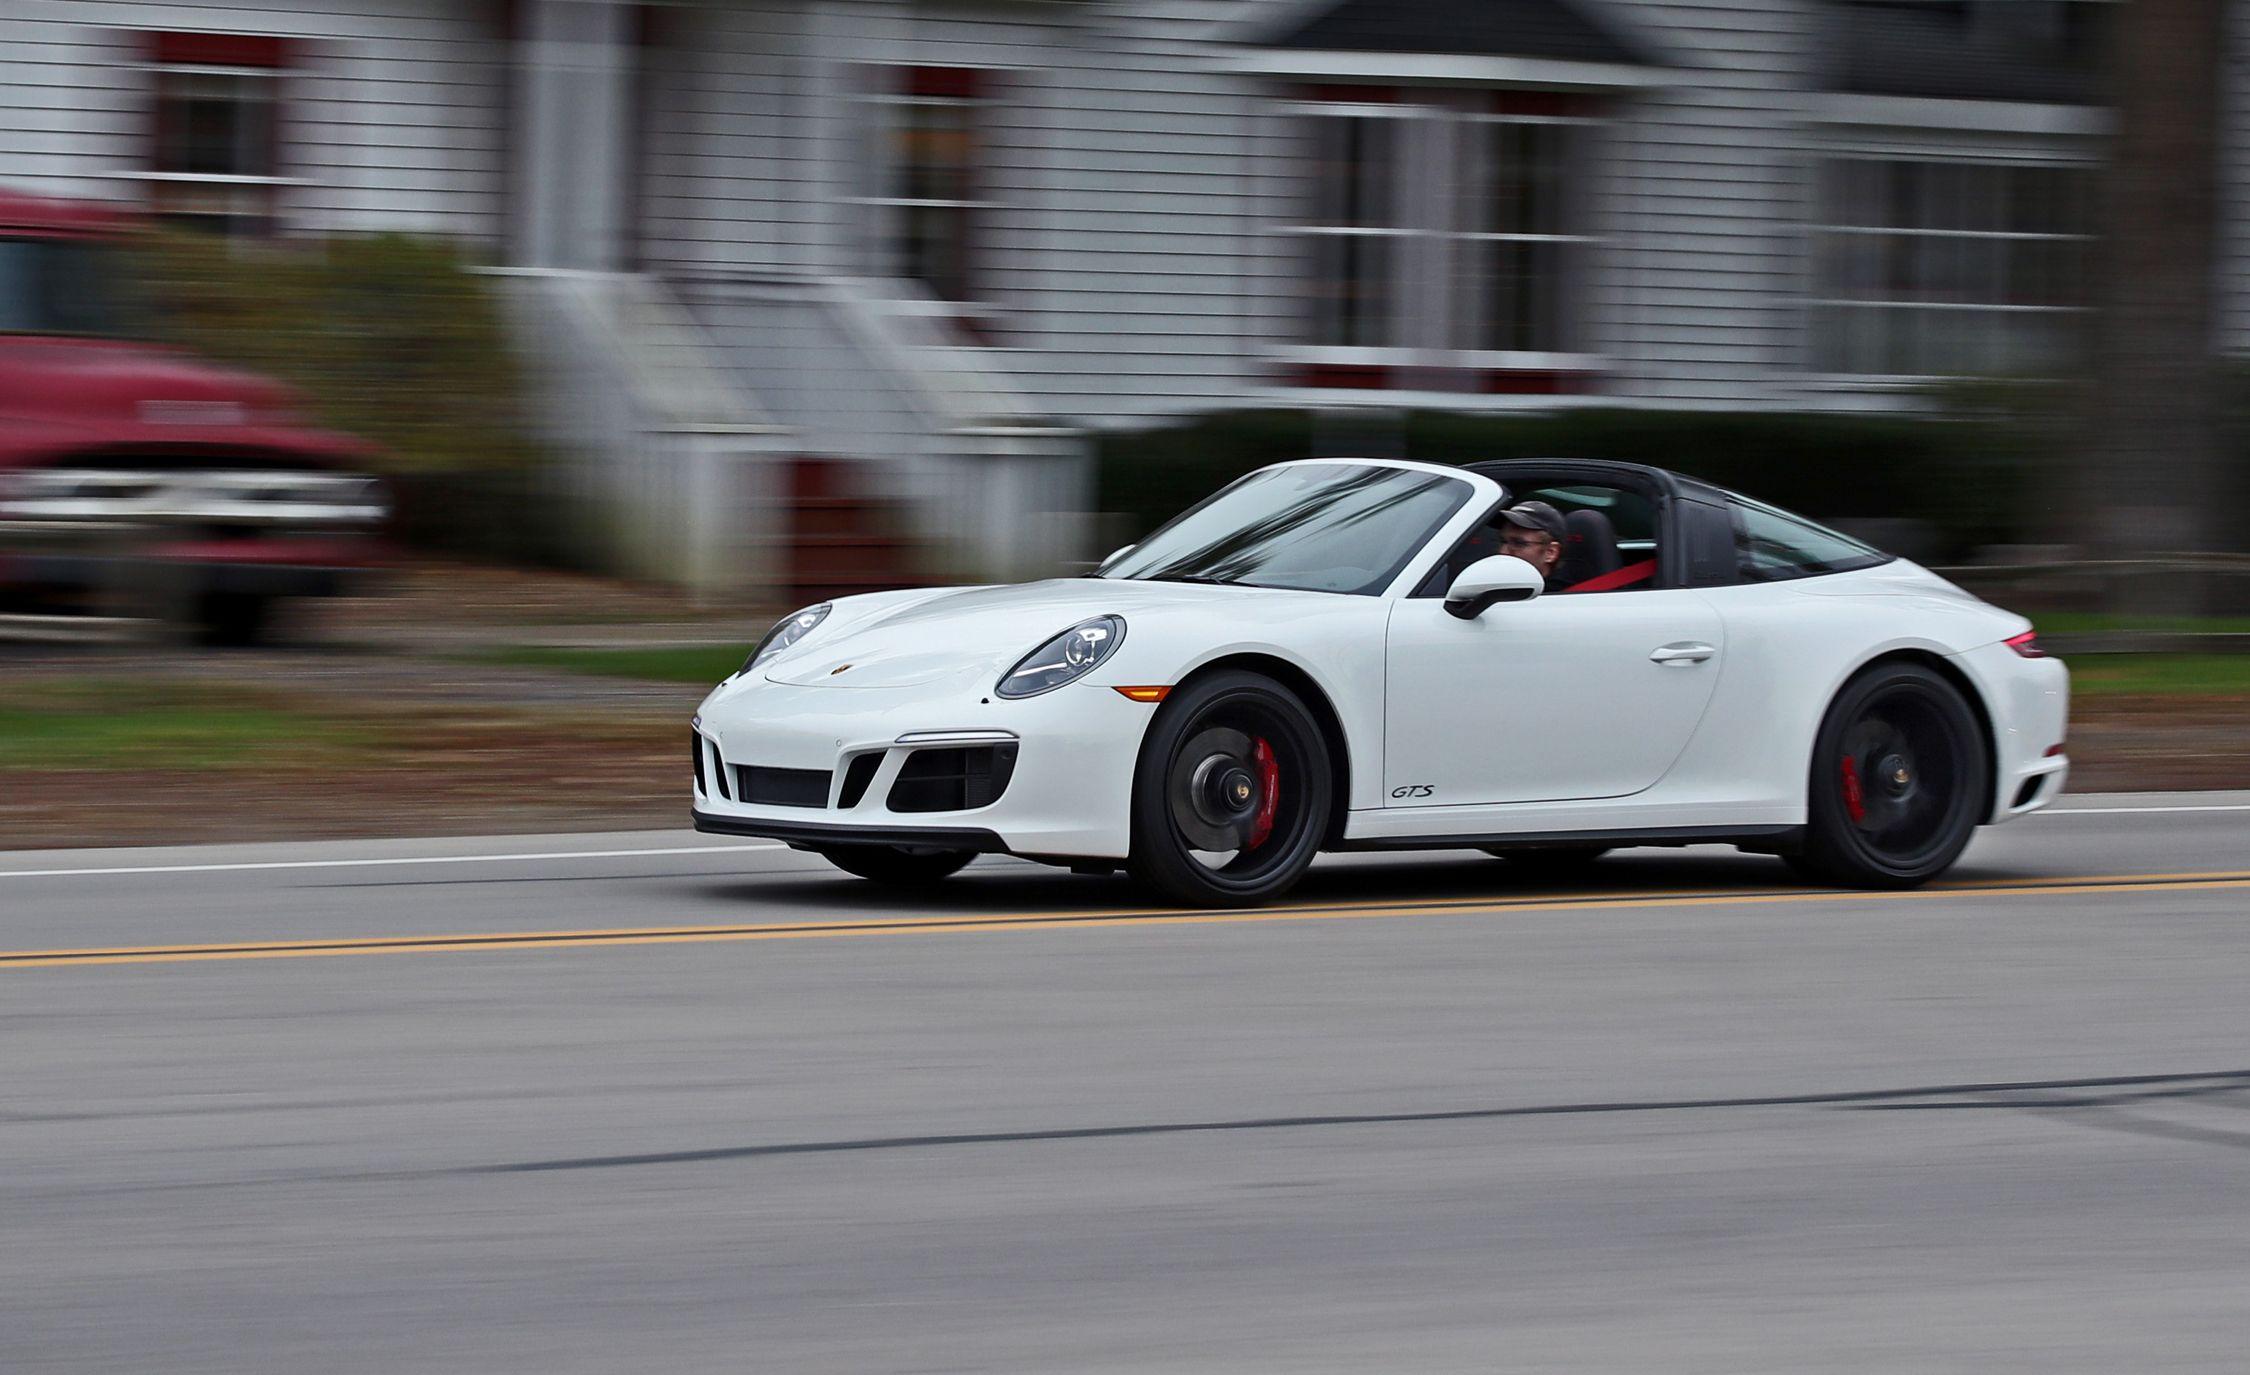 2017 Porsche 911 Targa 4 Gts Manual Test Review Car And Driver